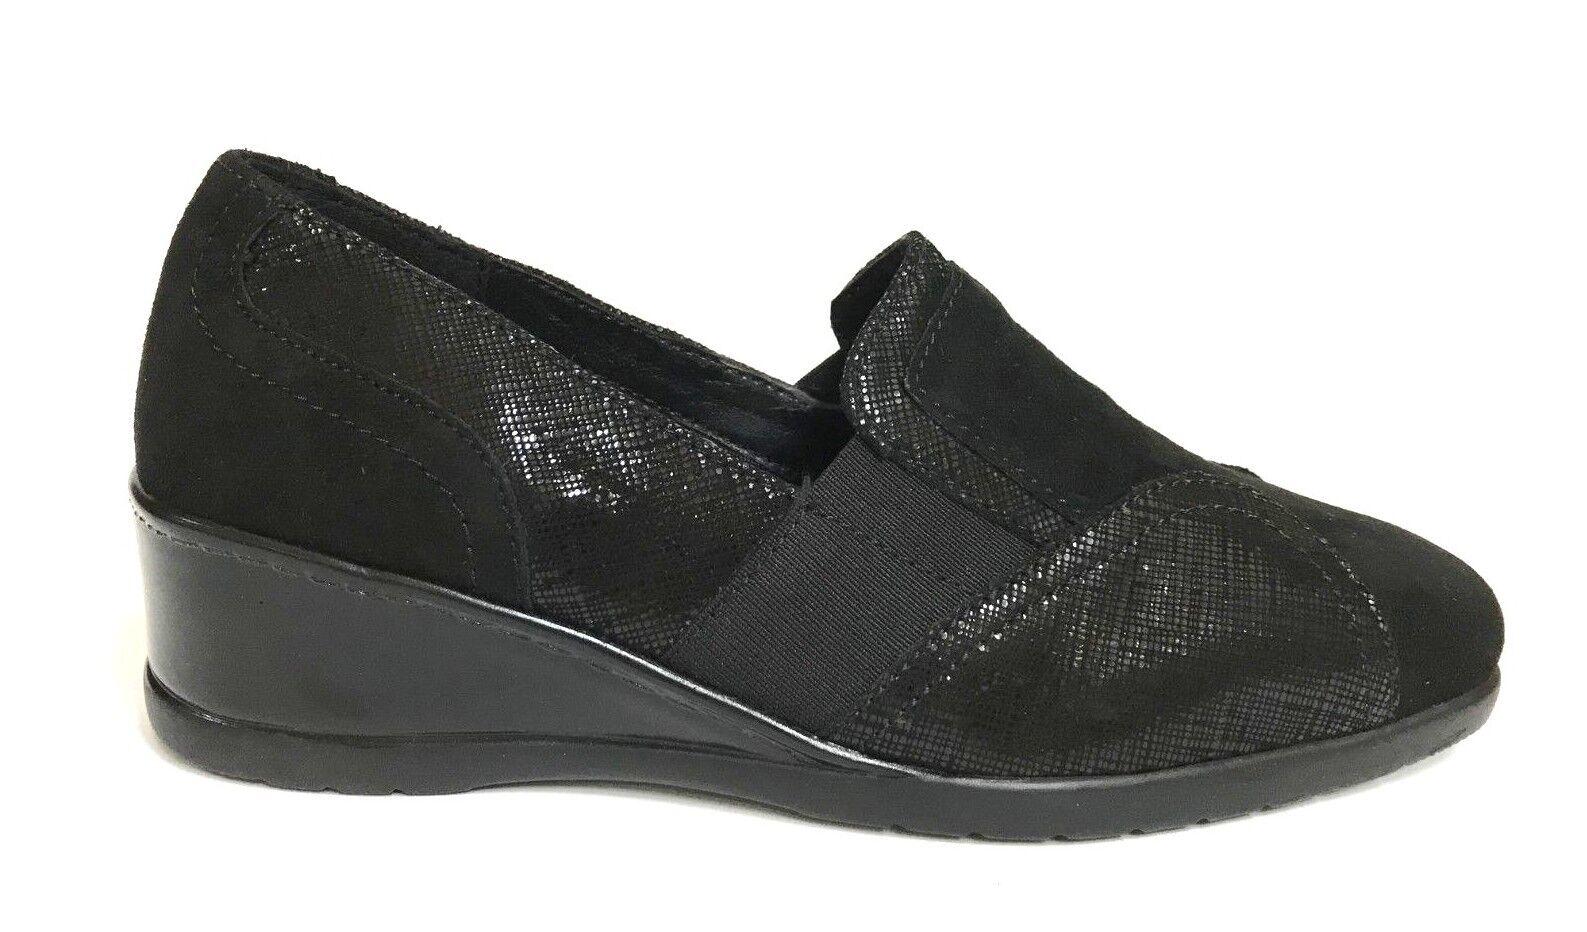 shoes women CINZIA SOFT MOCASSINI COMFORT 9074 black INVERNO 2018 19 SCONTO 30%